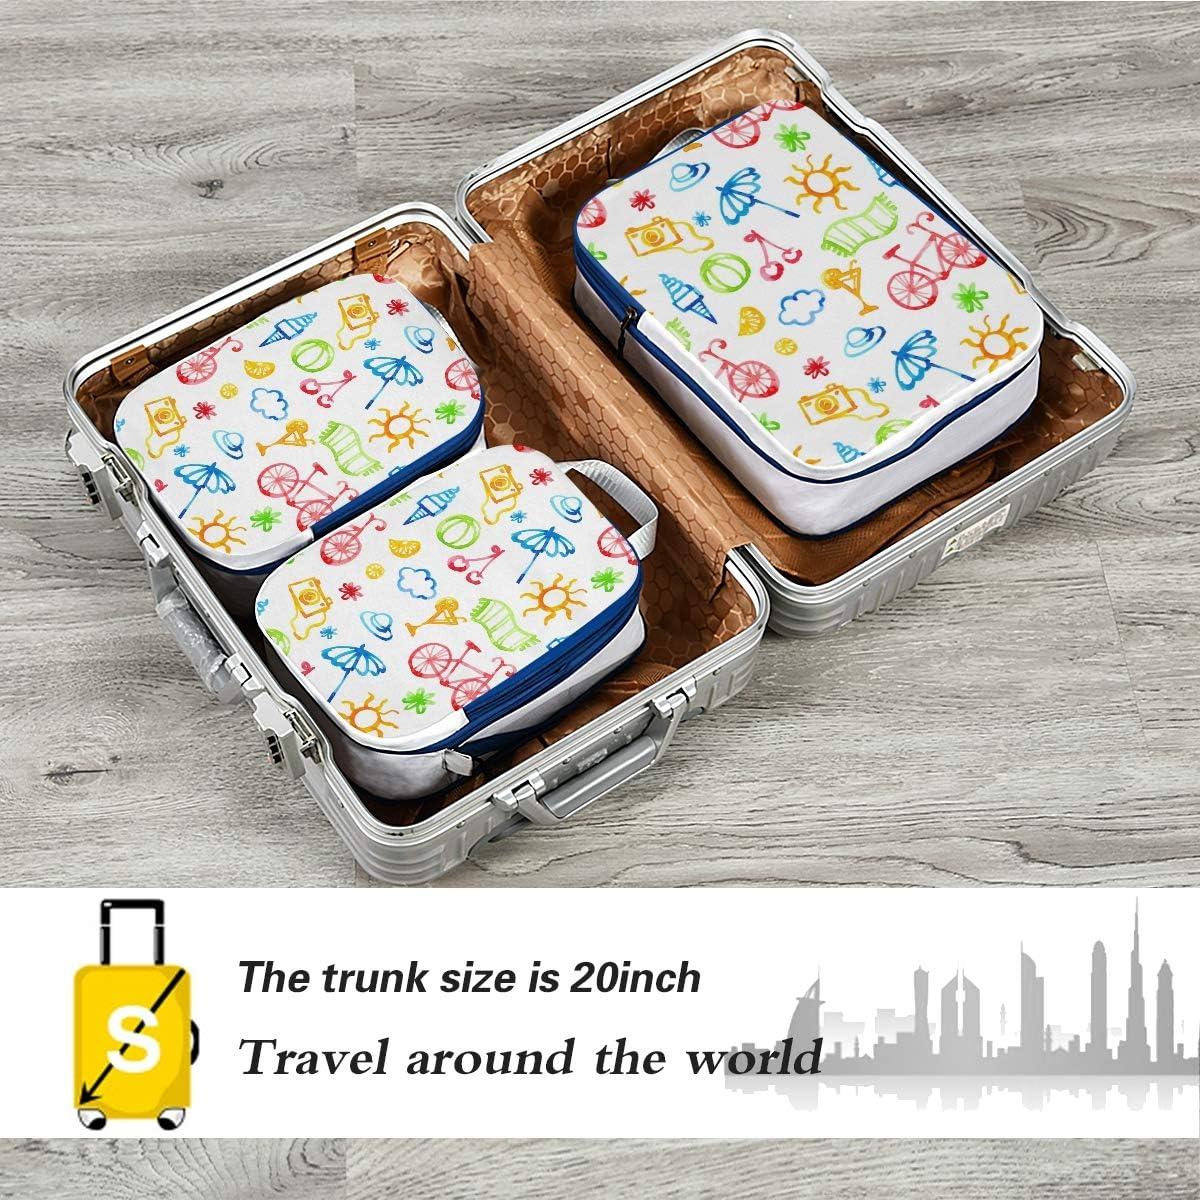 r Camera Bike Ice Cream 3 Set Packing Cubes,2 Various Sizes Travel Luggage Packing Organizers